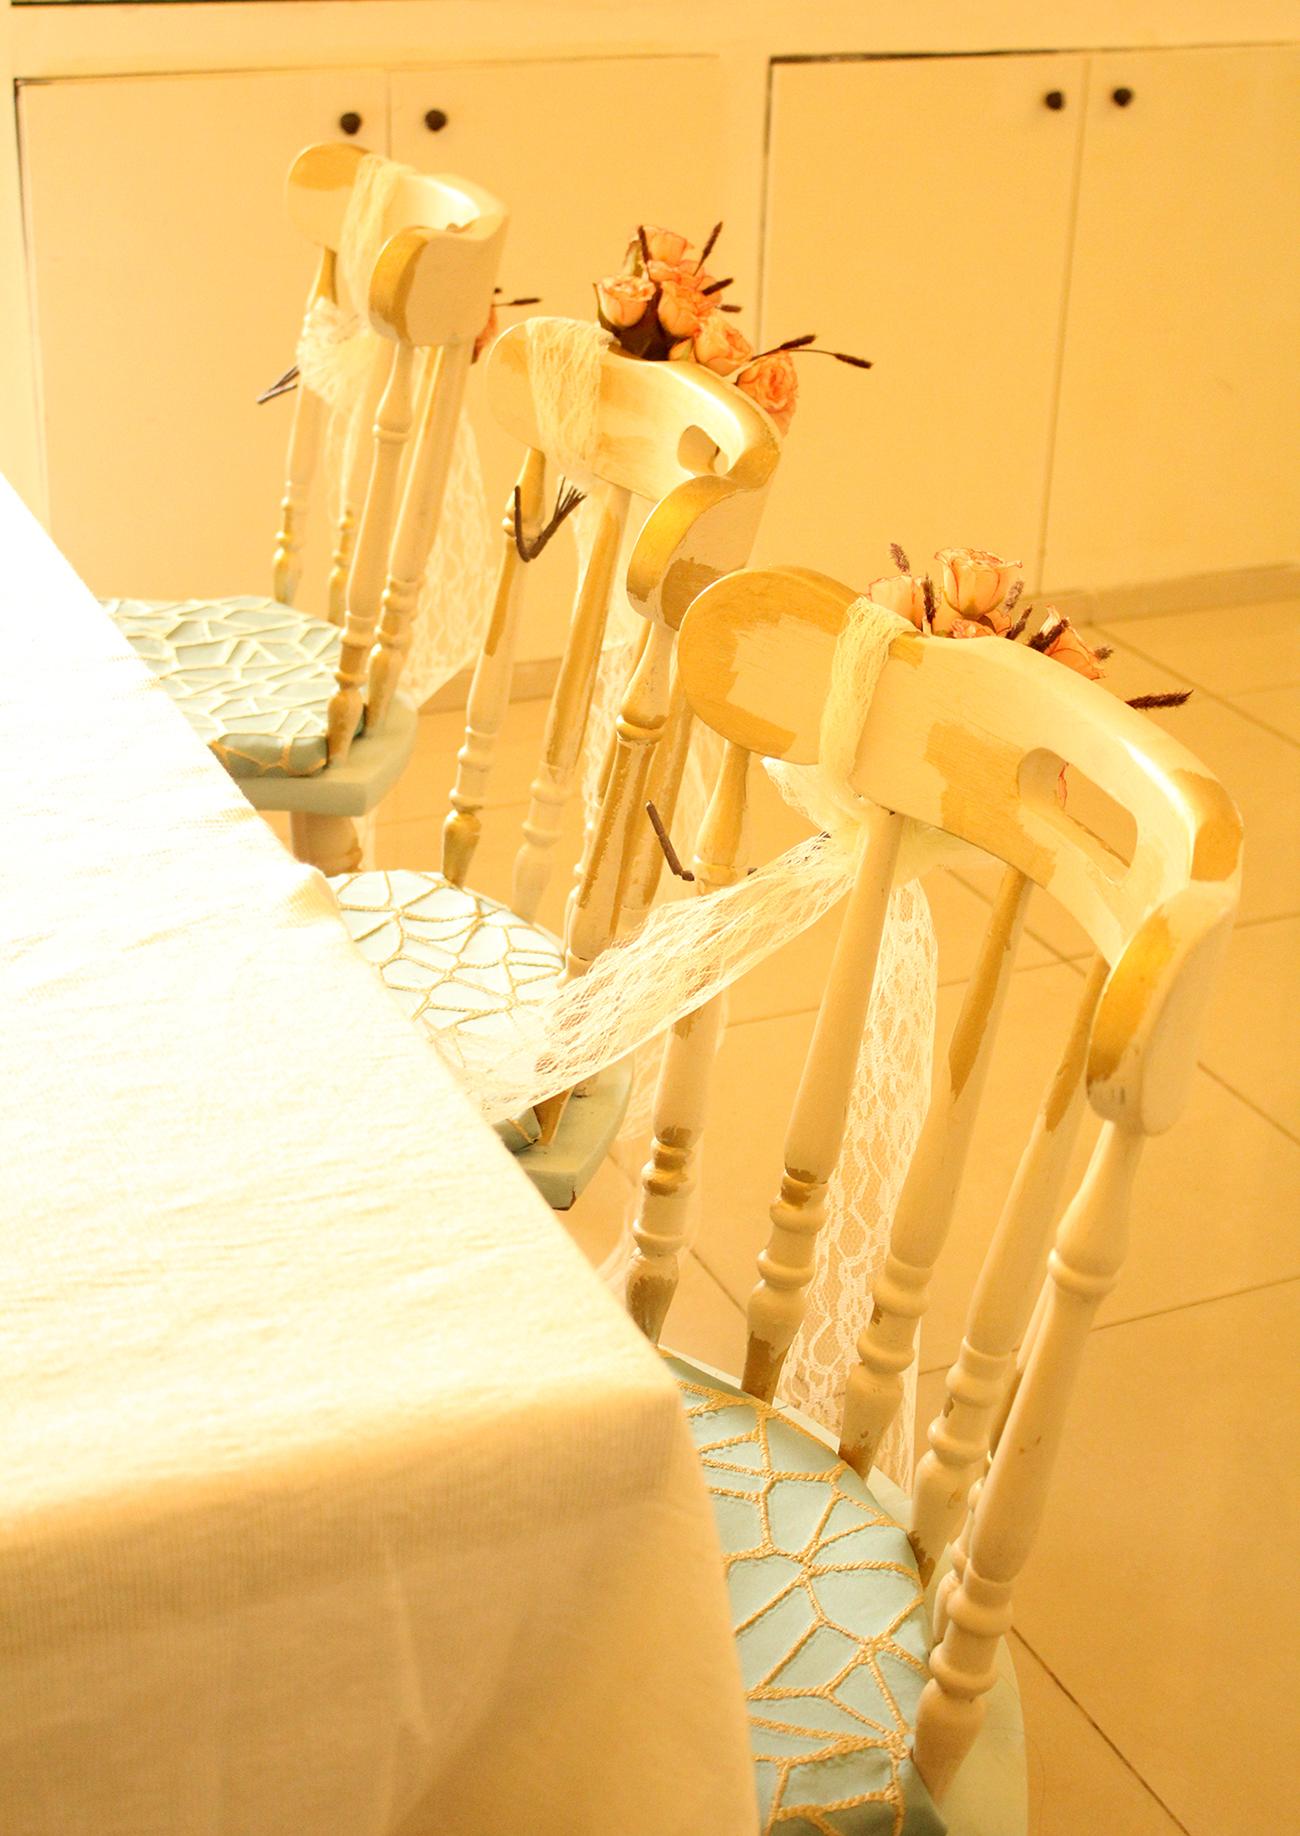 IMG 8077 - חידוש כסאות לפינת אוכל בסלון